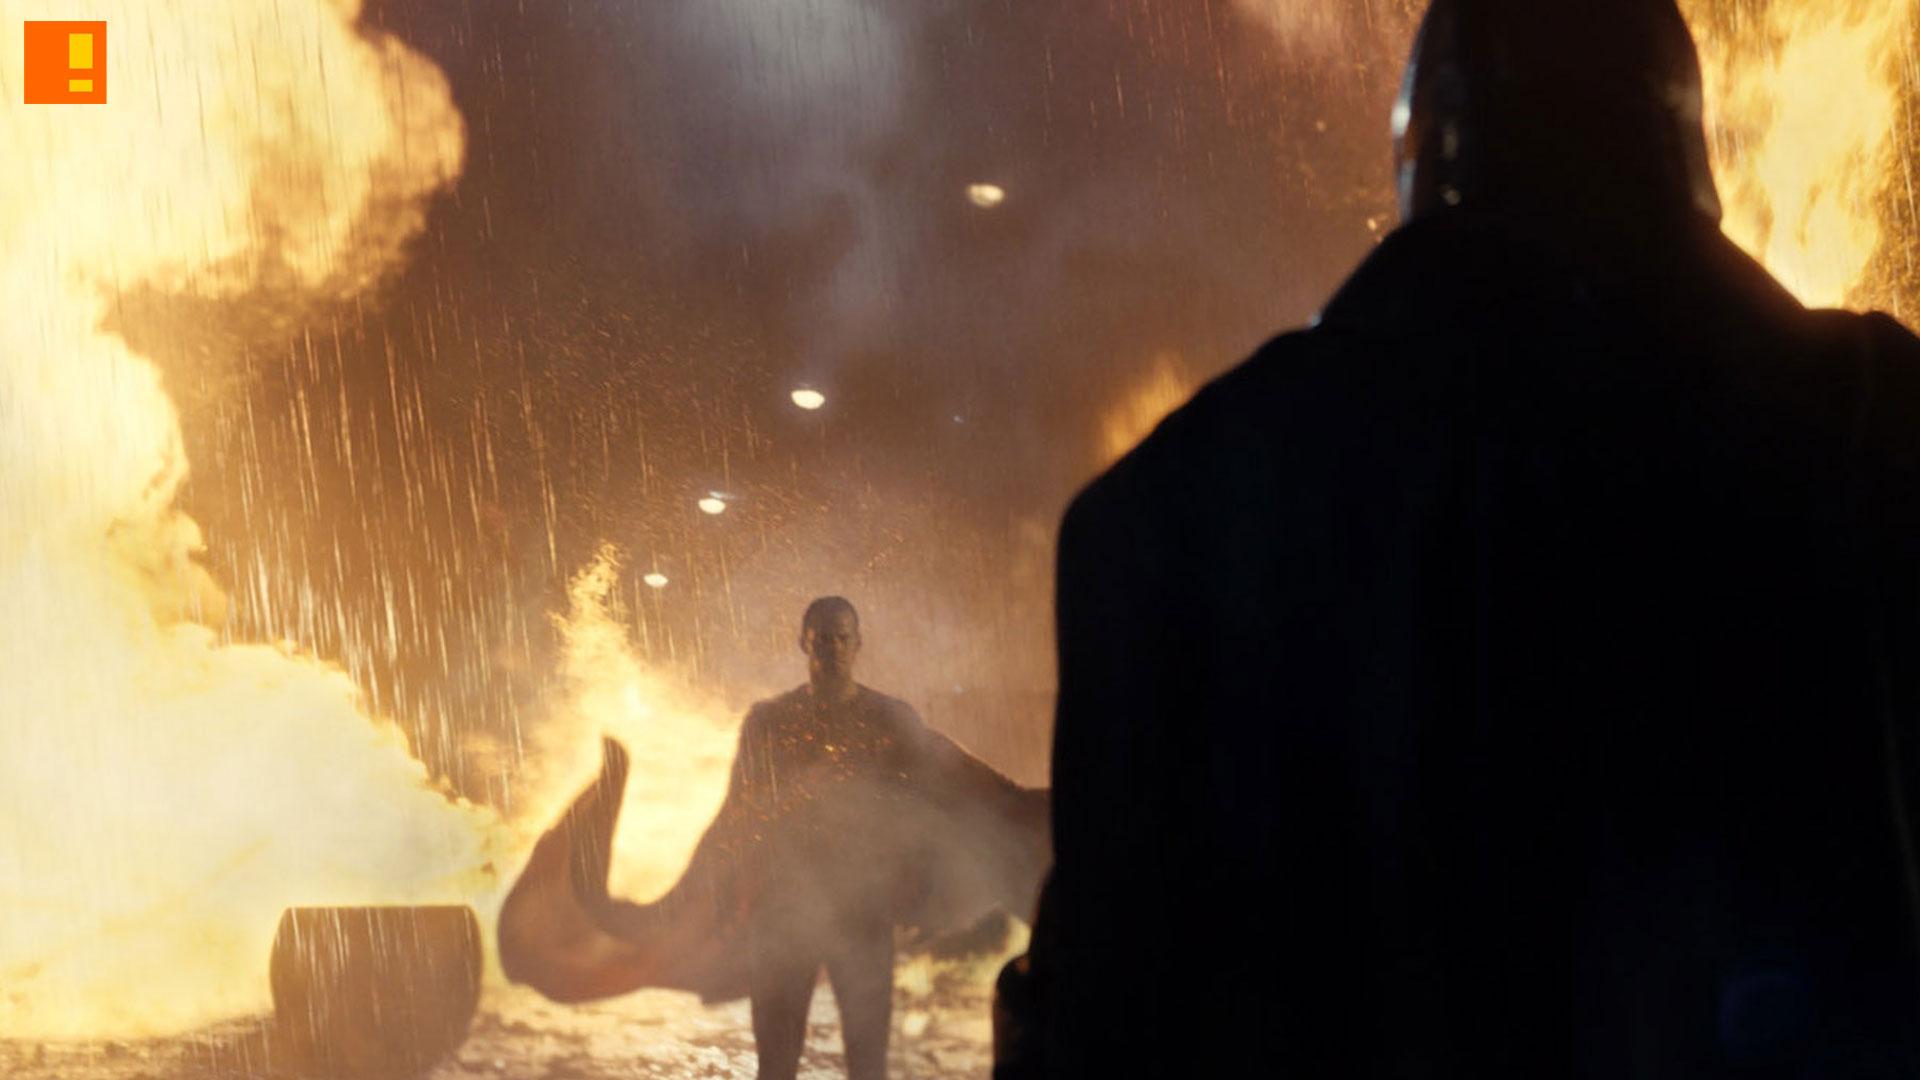 batman v superman. dawn of justice. dc comics. warner bros. pictures. entertainment on tap. the action pixel. @theactionpixel